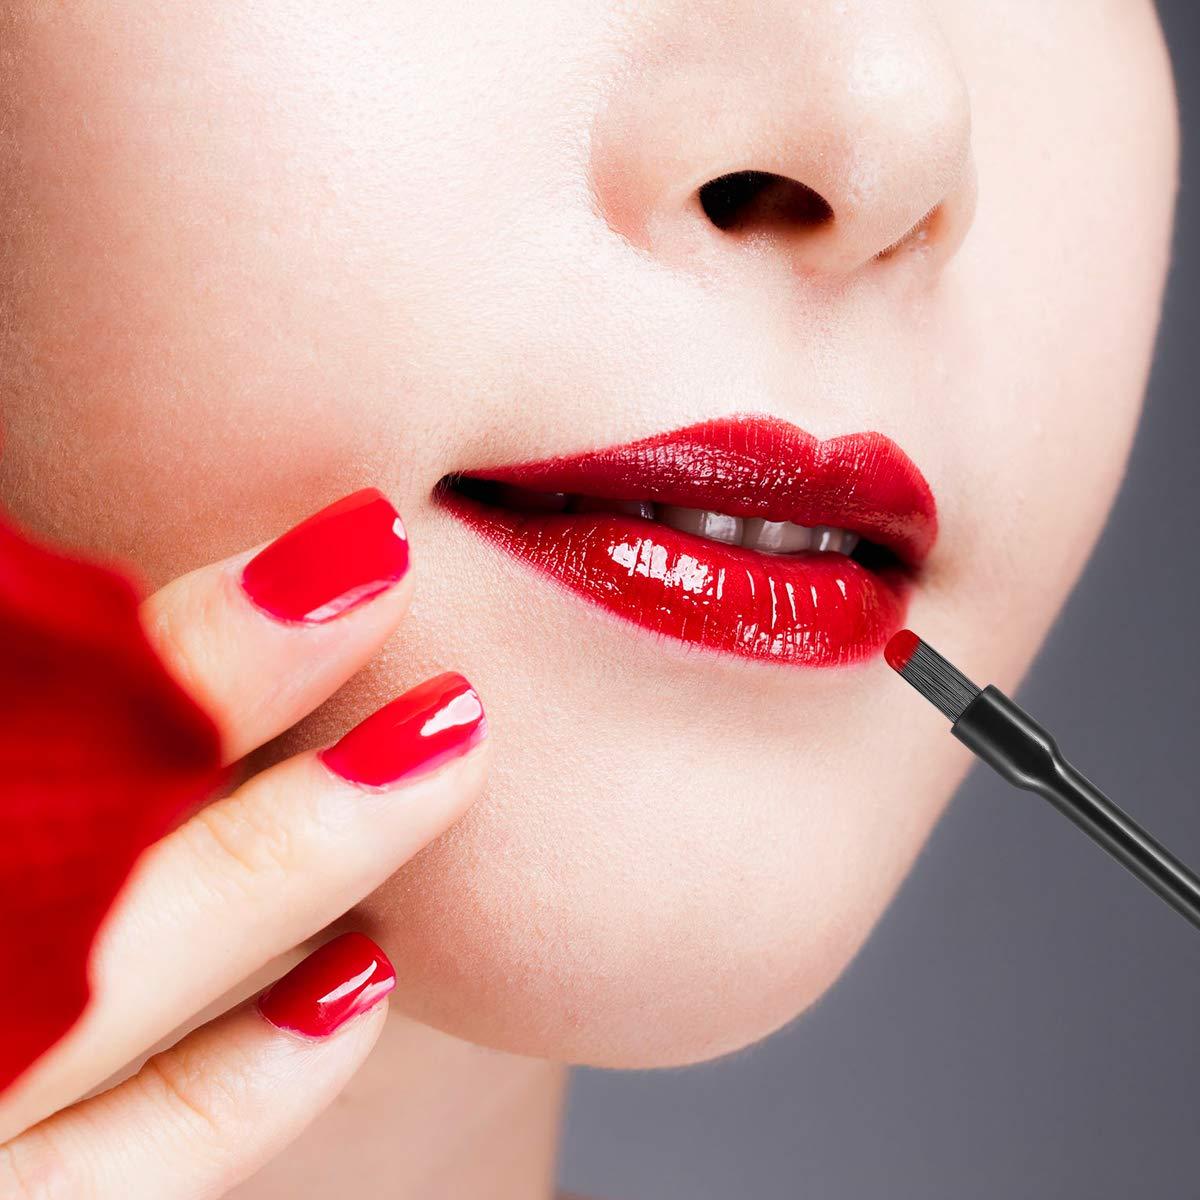 Frcolor Disposable Lip Gloss Brushes Lipstick Wands Applicator Flat Brush Makeup Cosmetic Tools (100 Pcs): Beauty